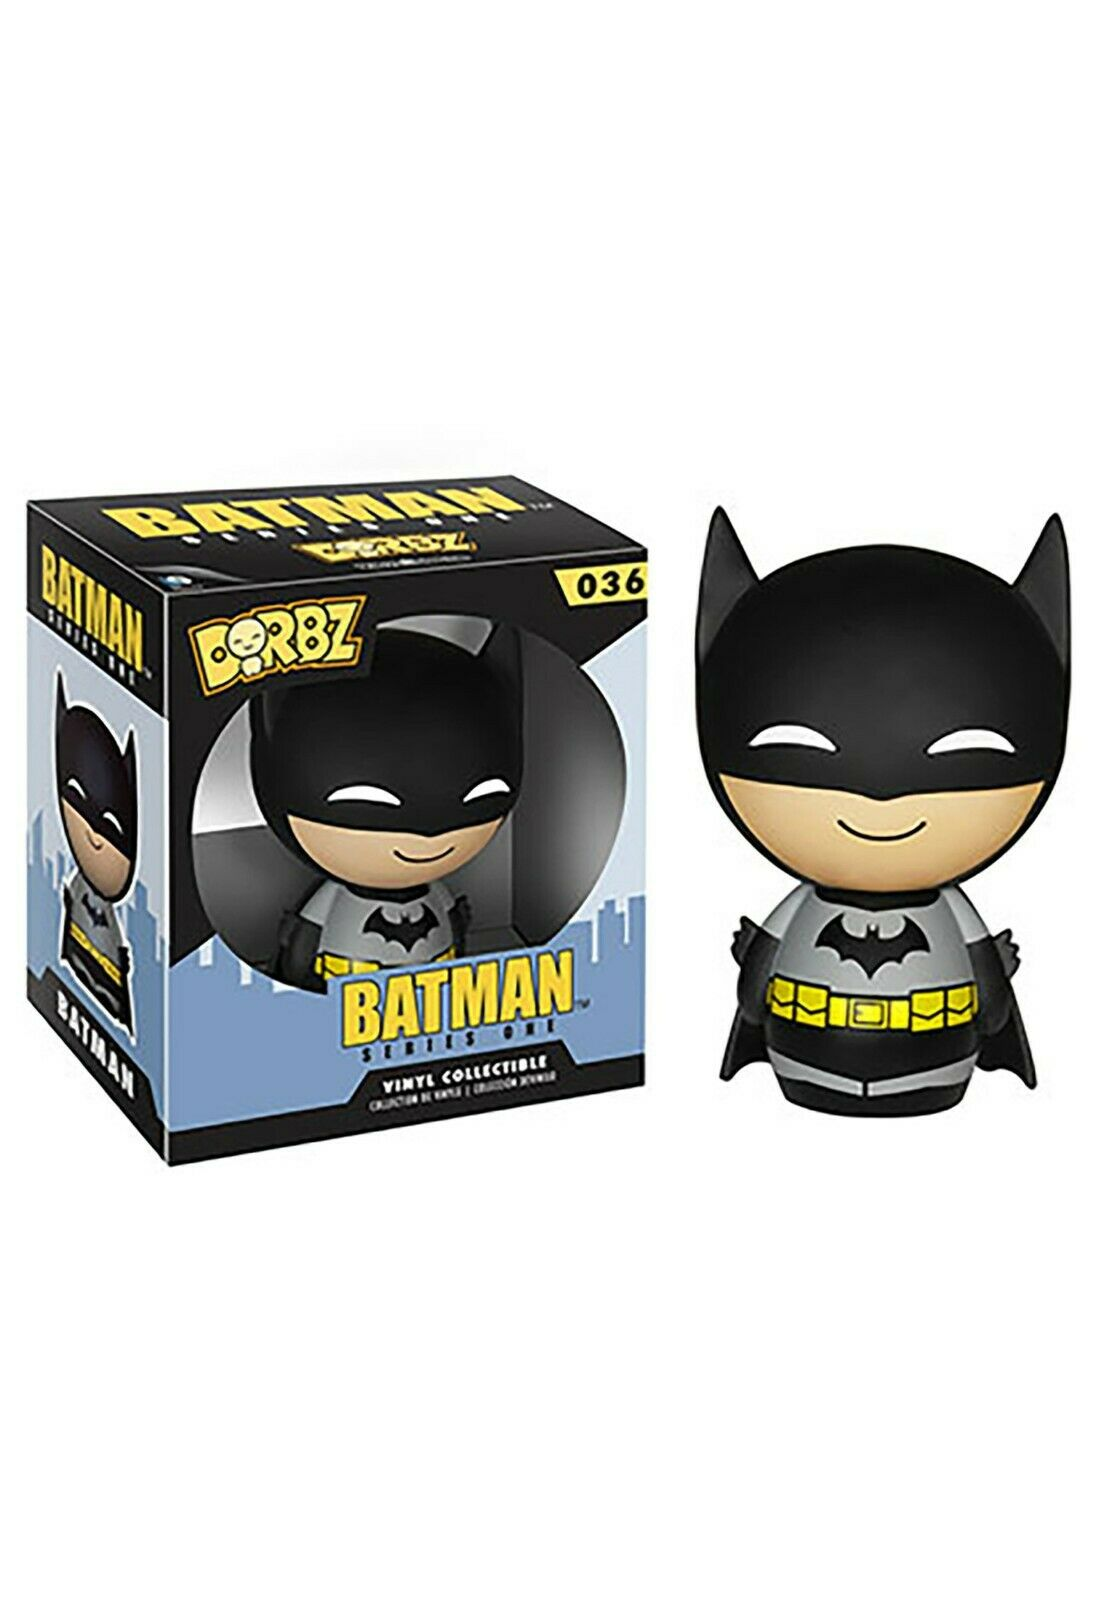 Batman - Vinyl Sugar Dorbz N° 036